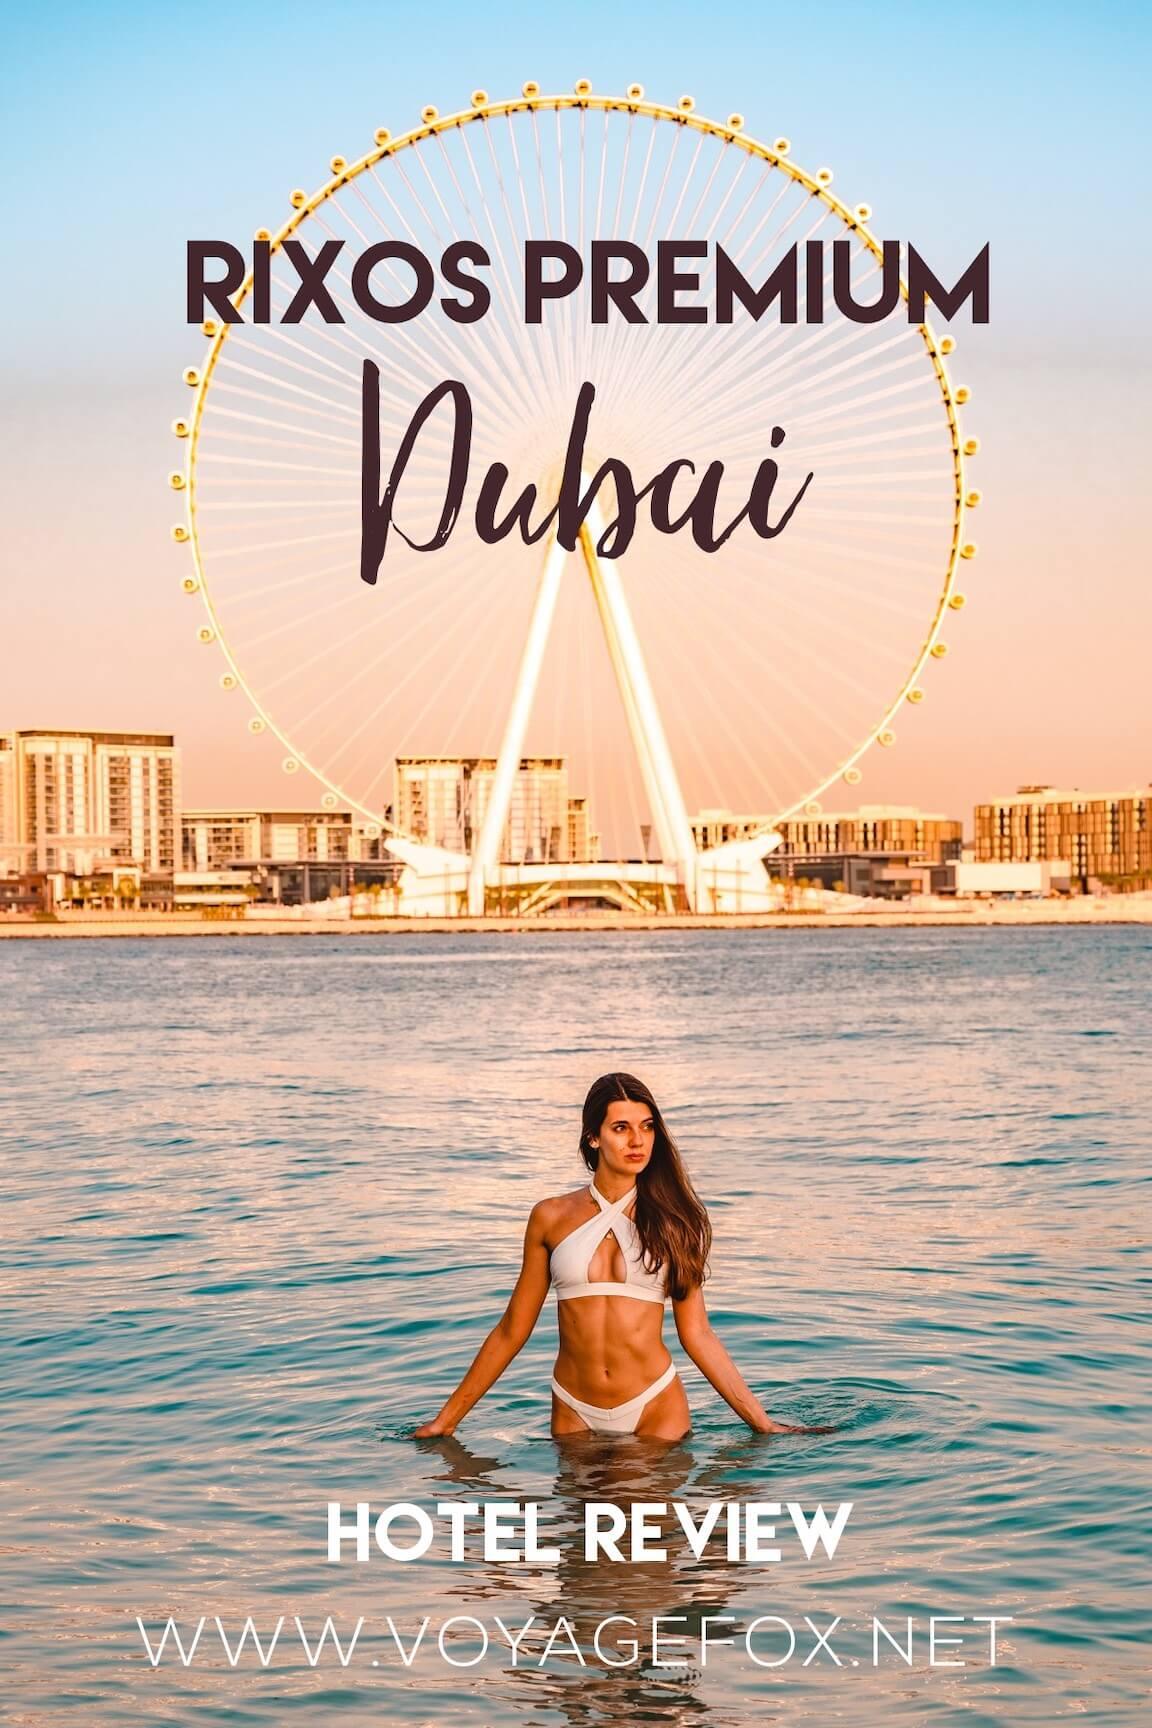 The Rixos Premium Dubai hotel review cover